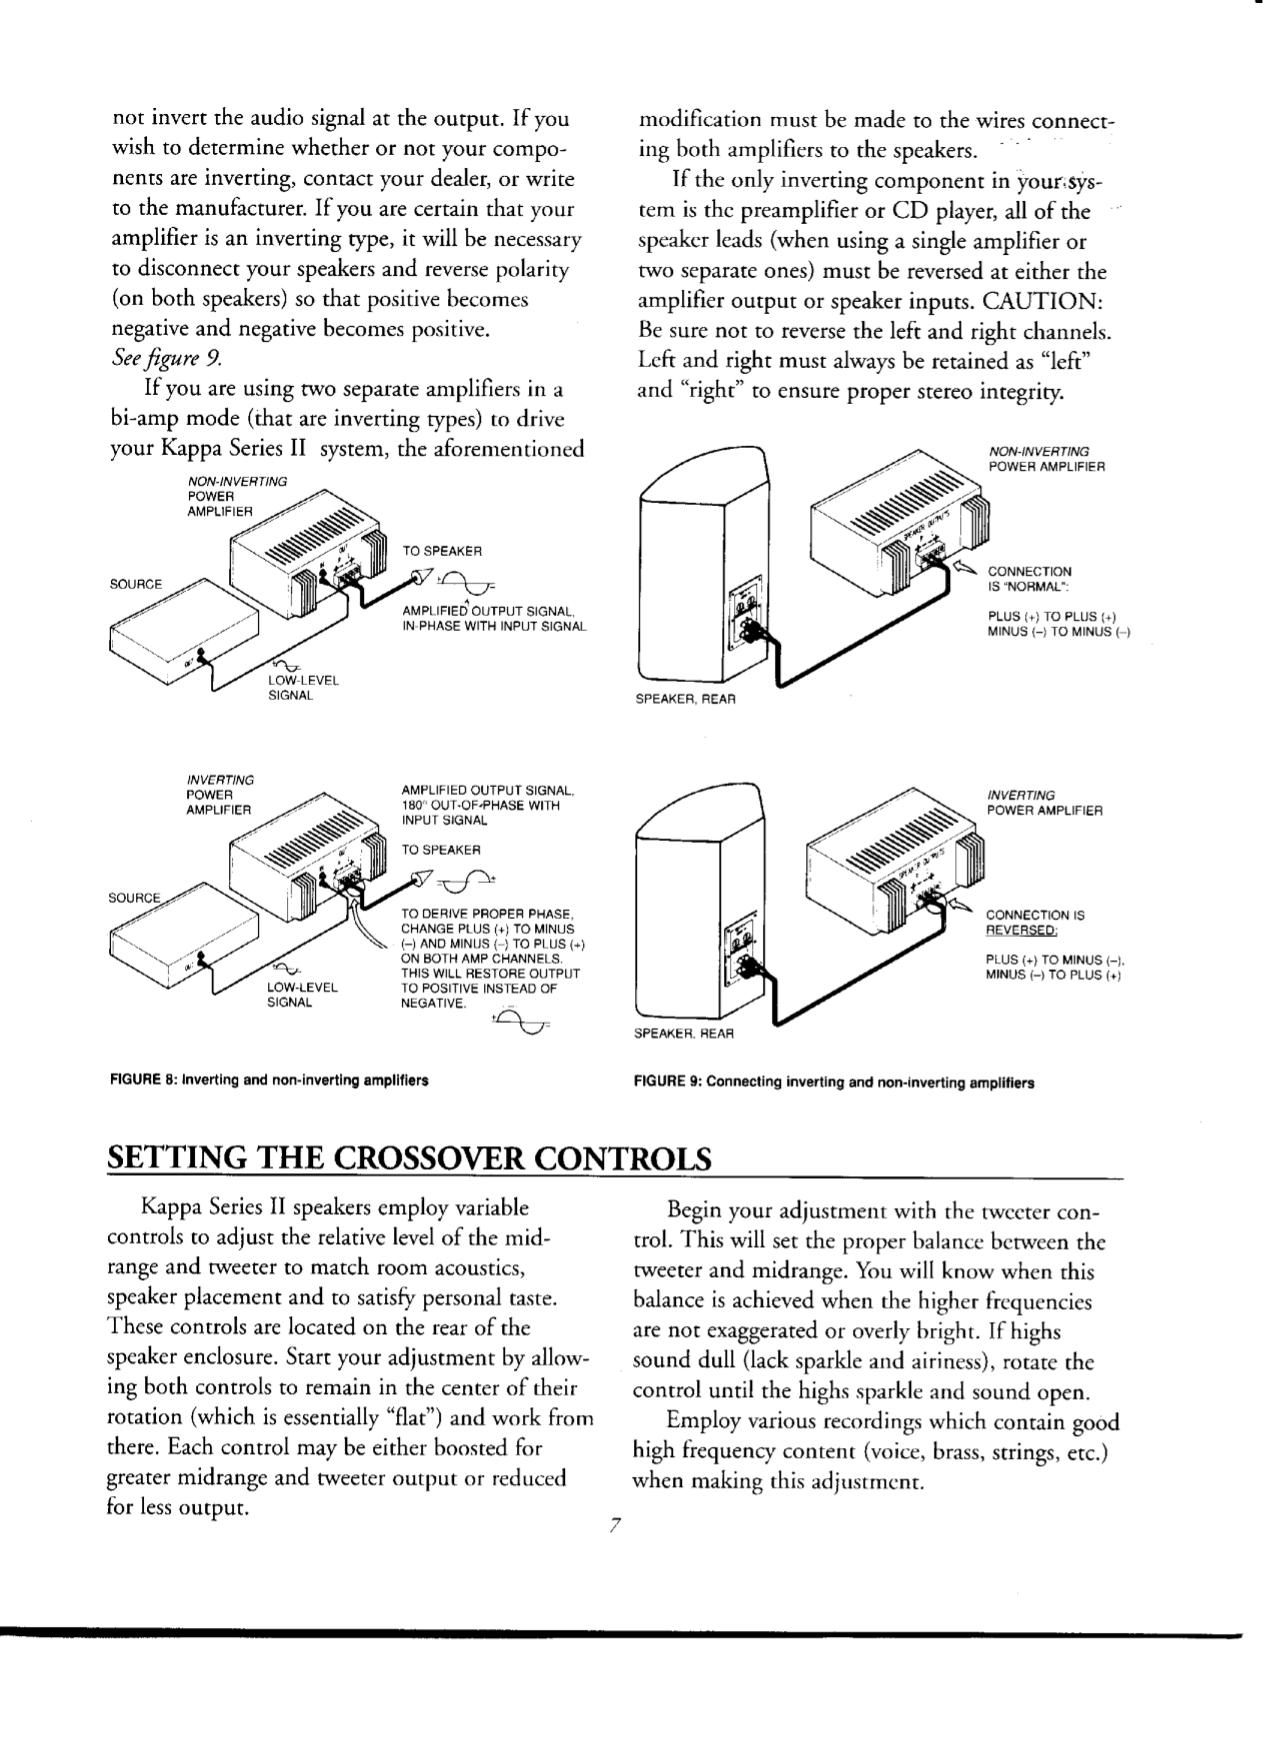 pdf manual for infinity car amplifier kappa series kappa one rh umlib com User Manual Kindle Fire User Guide